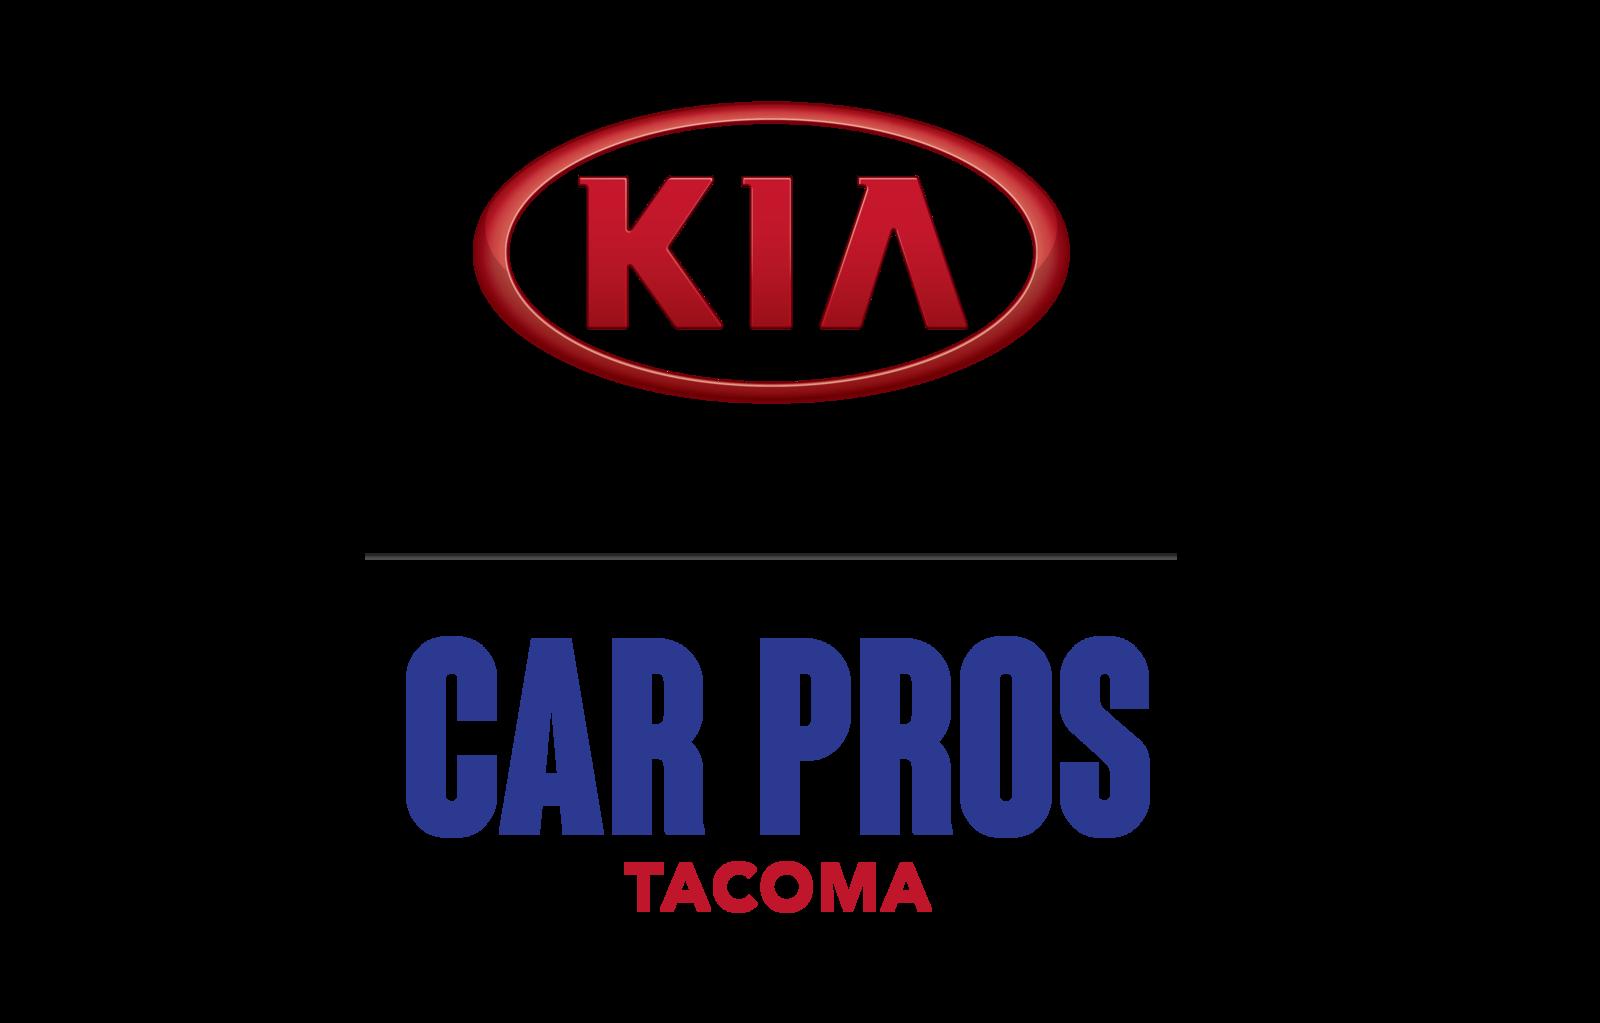 Car Pros Tacoma >> Car Pros Kia Tacoma Wa Read Consumer Reviews Browse